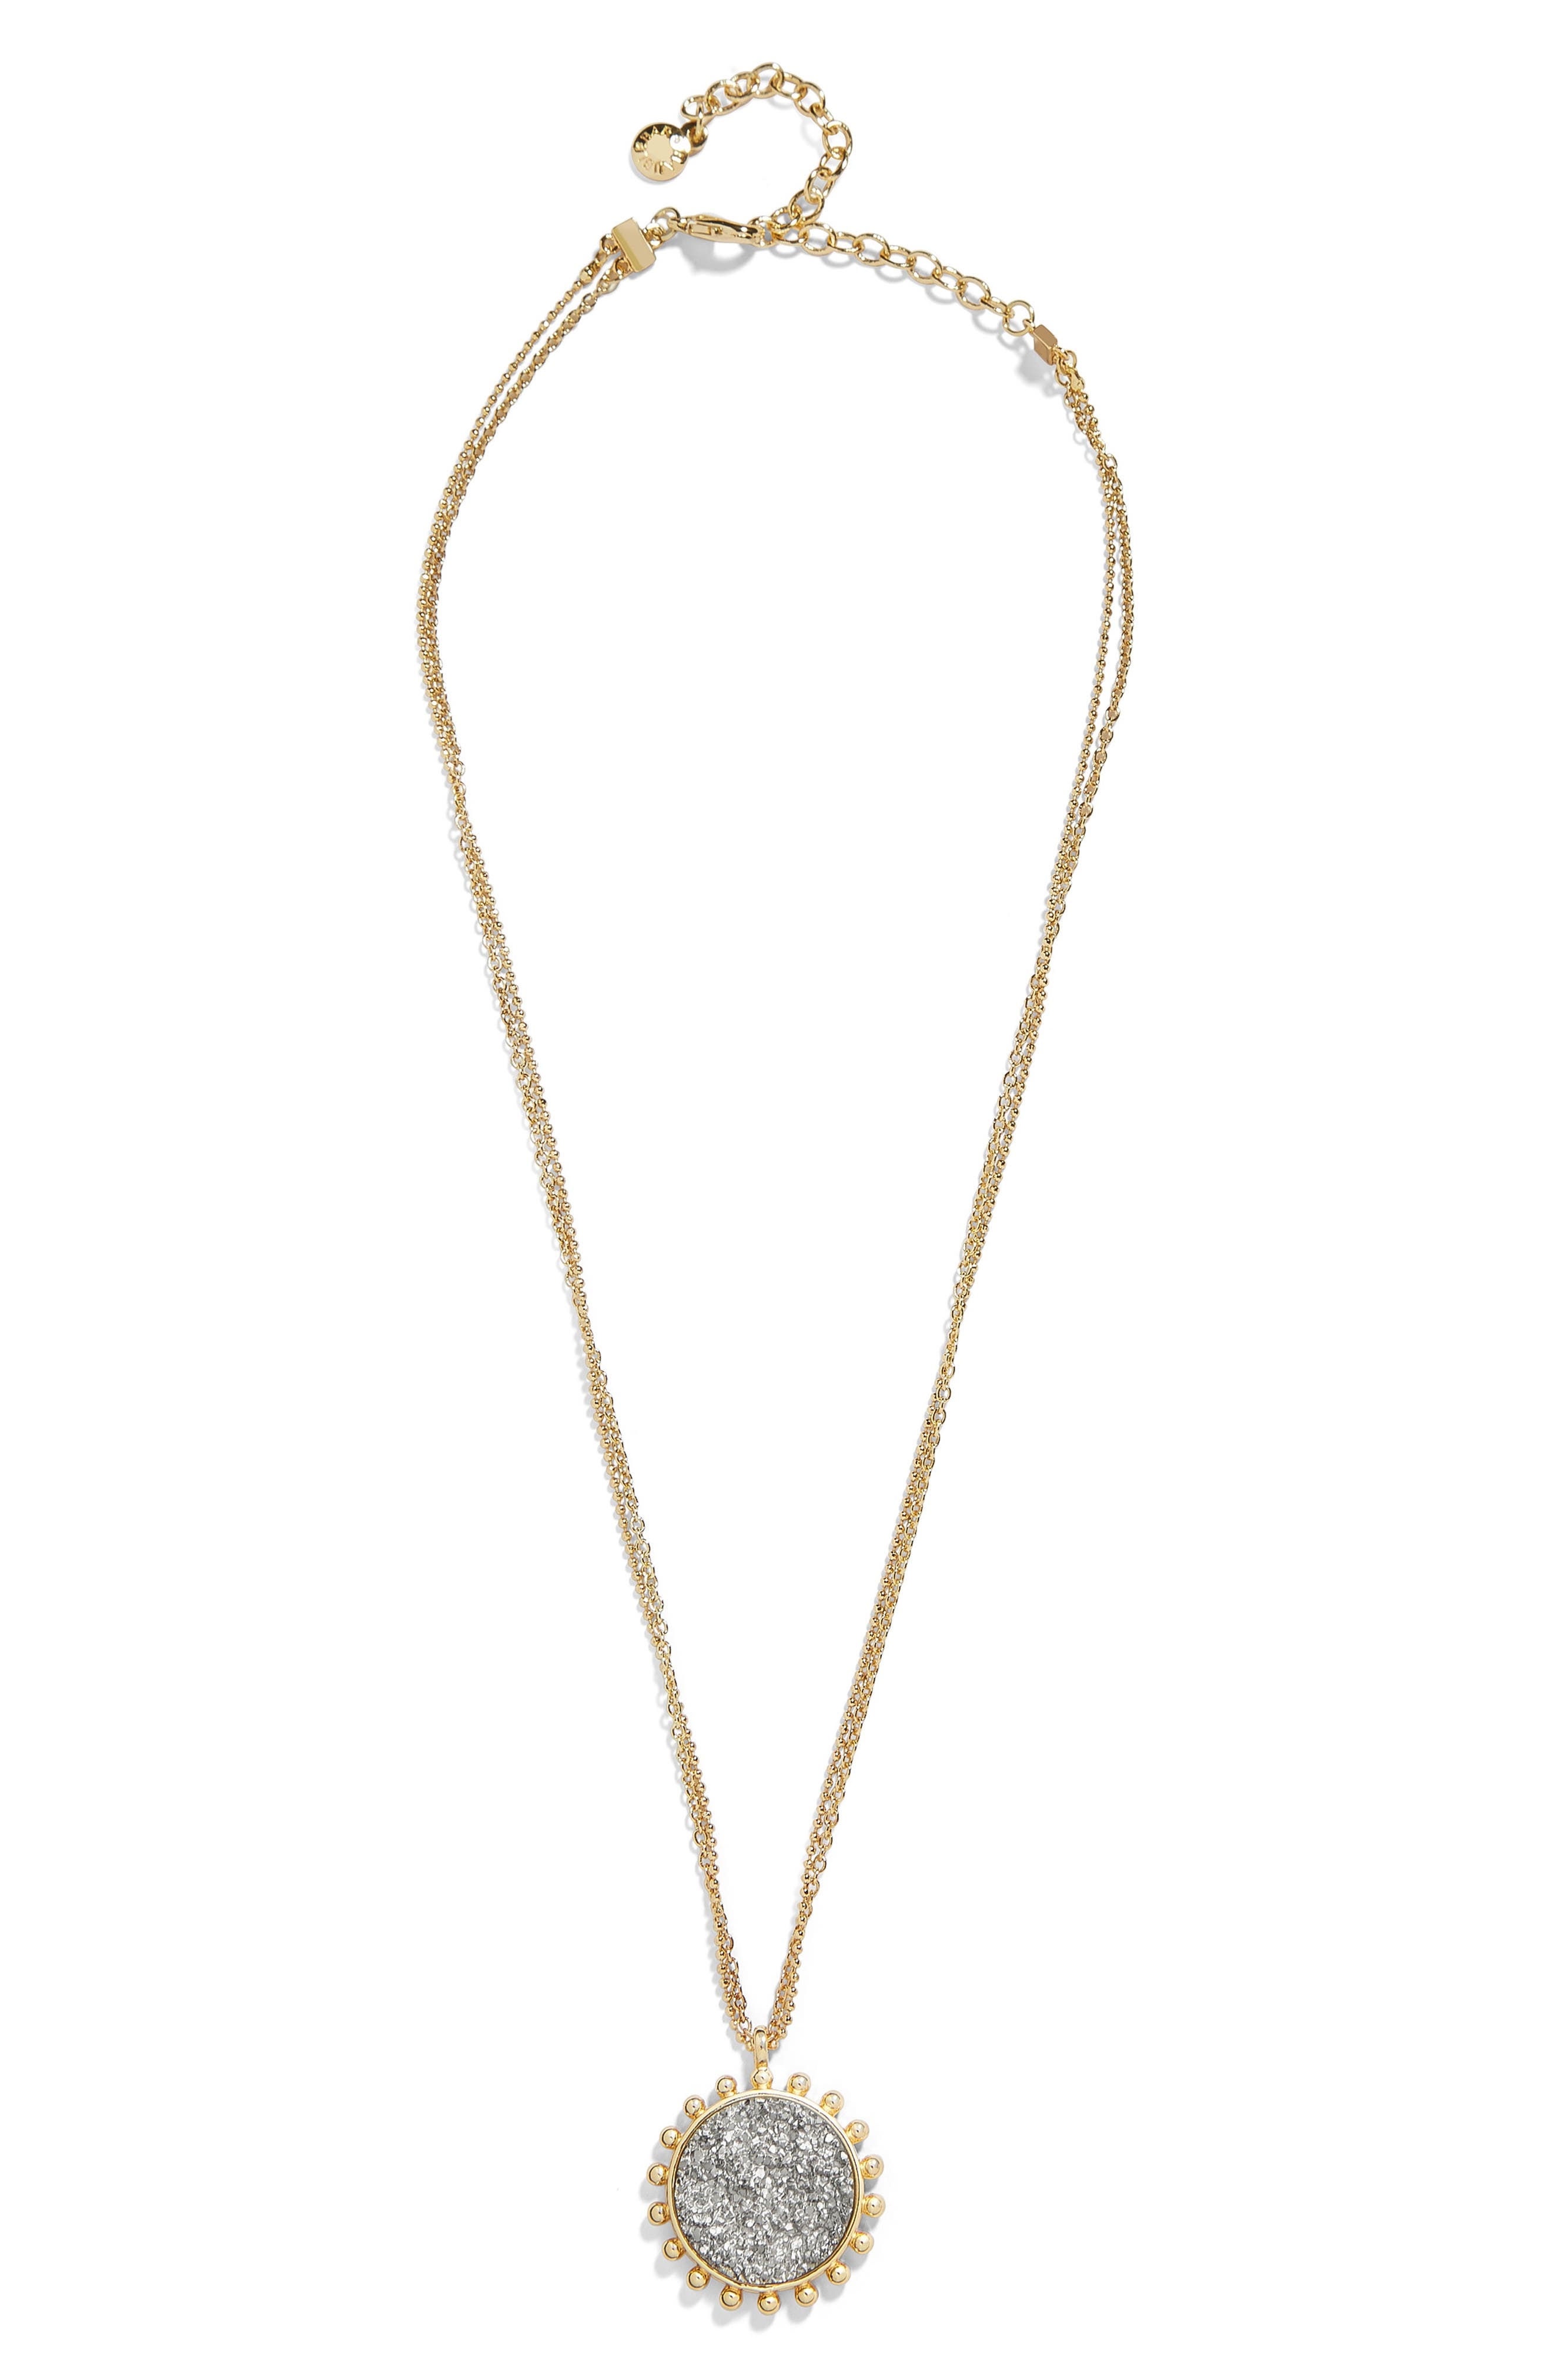 Kerison Drusy Pendant Necklace,                             Main thumbnail 1, color,                             METALLIC GREY